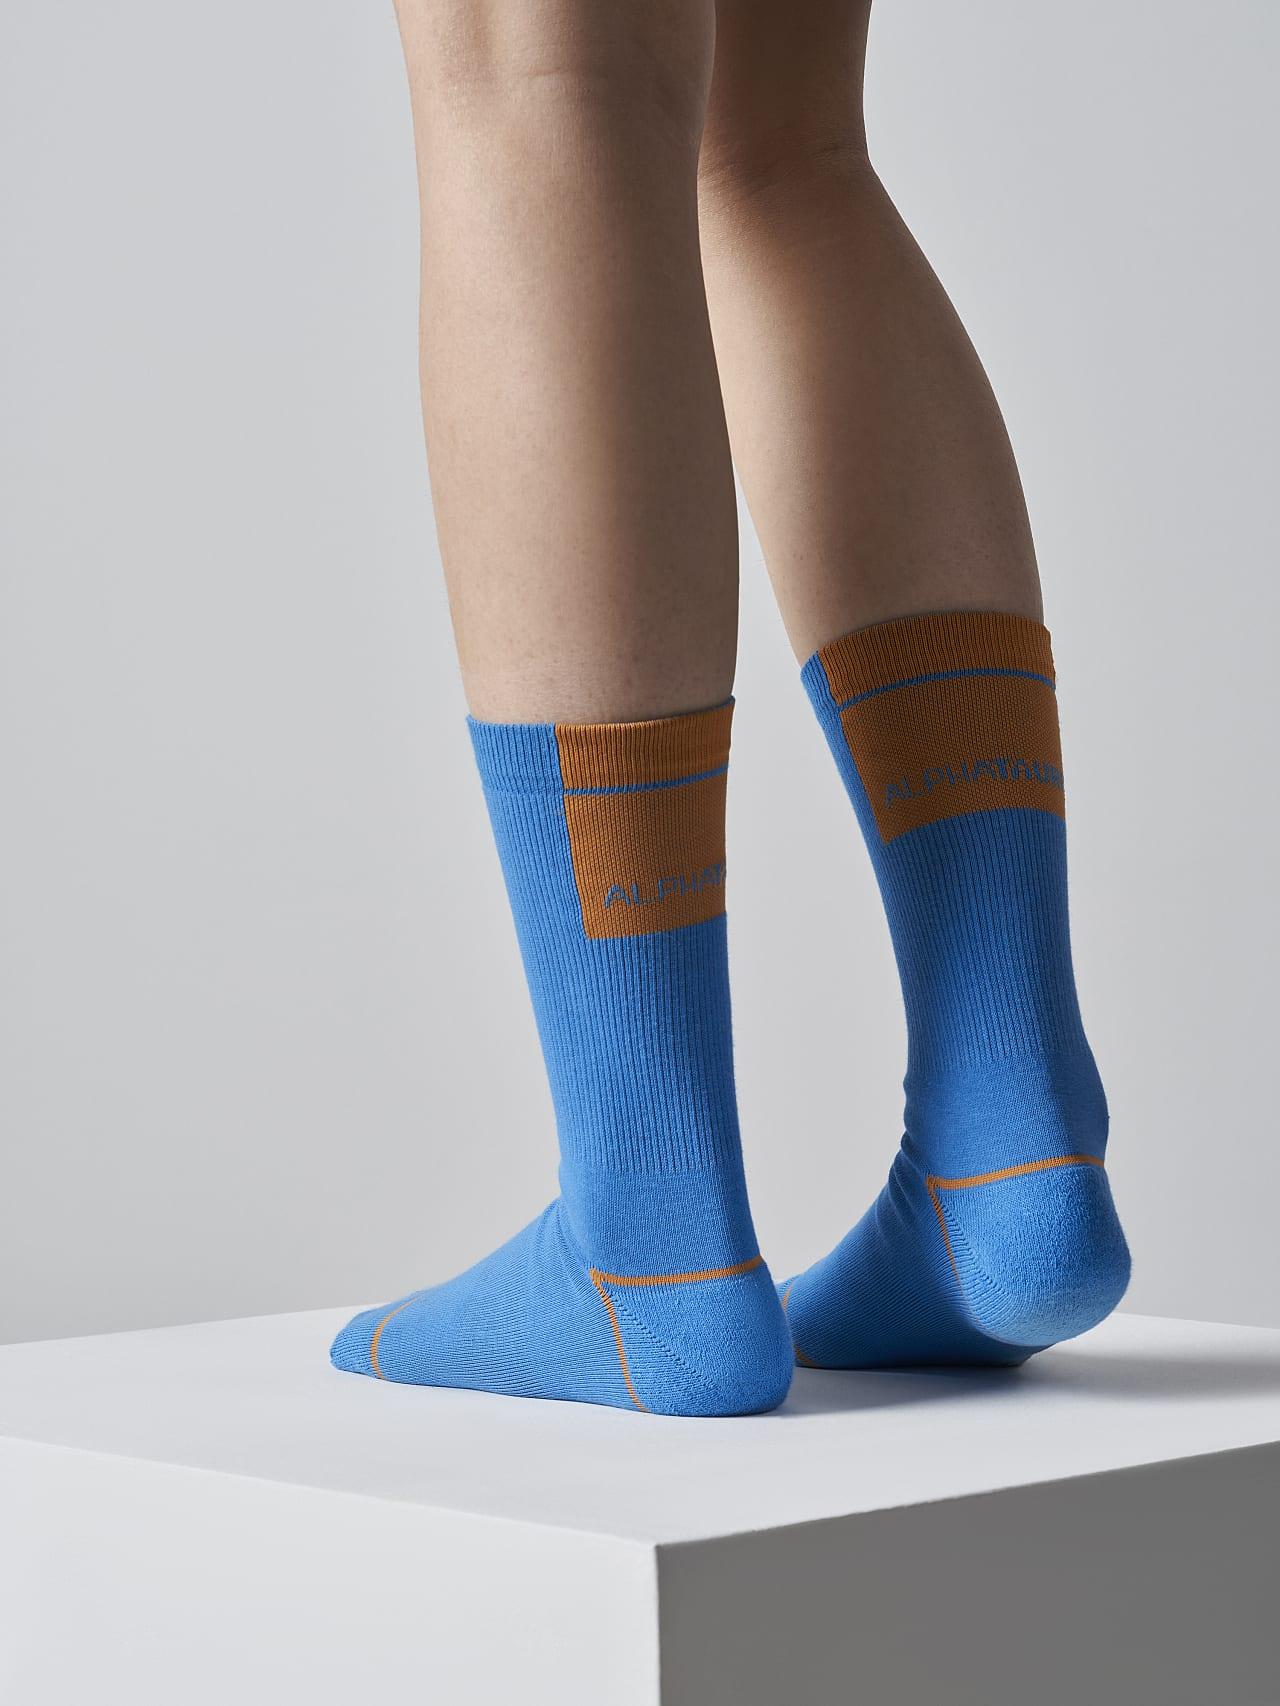 ATENI V3.Y5.02 Premium Knit Socks blue Front Alpha Tauri